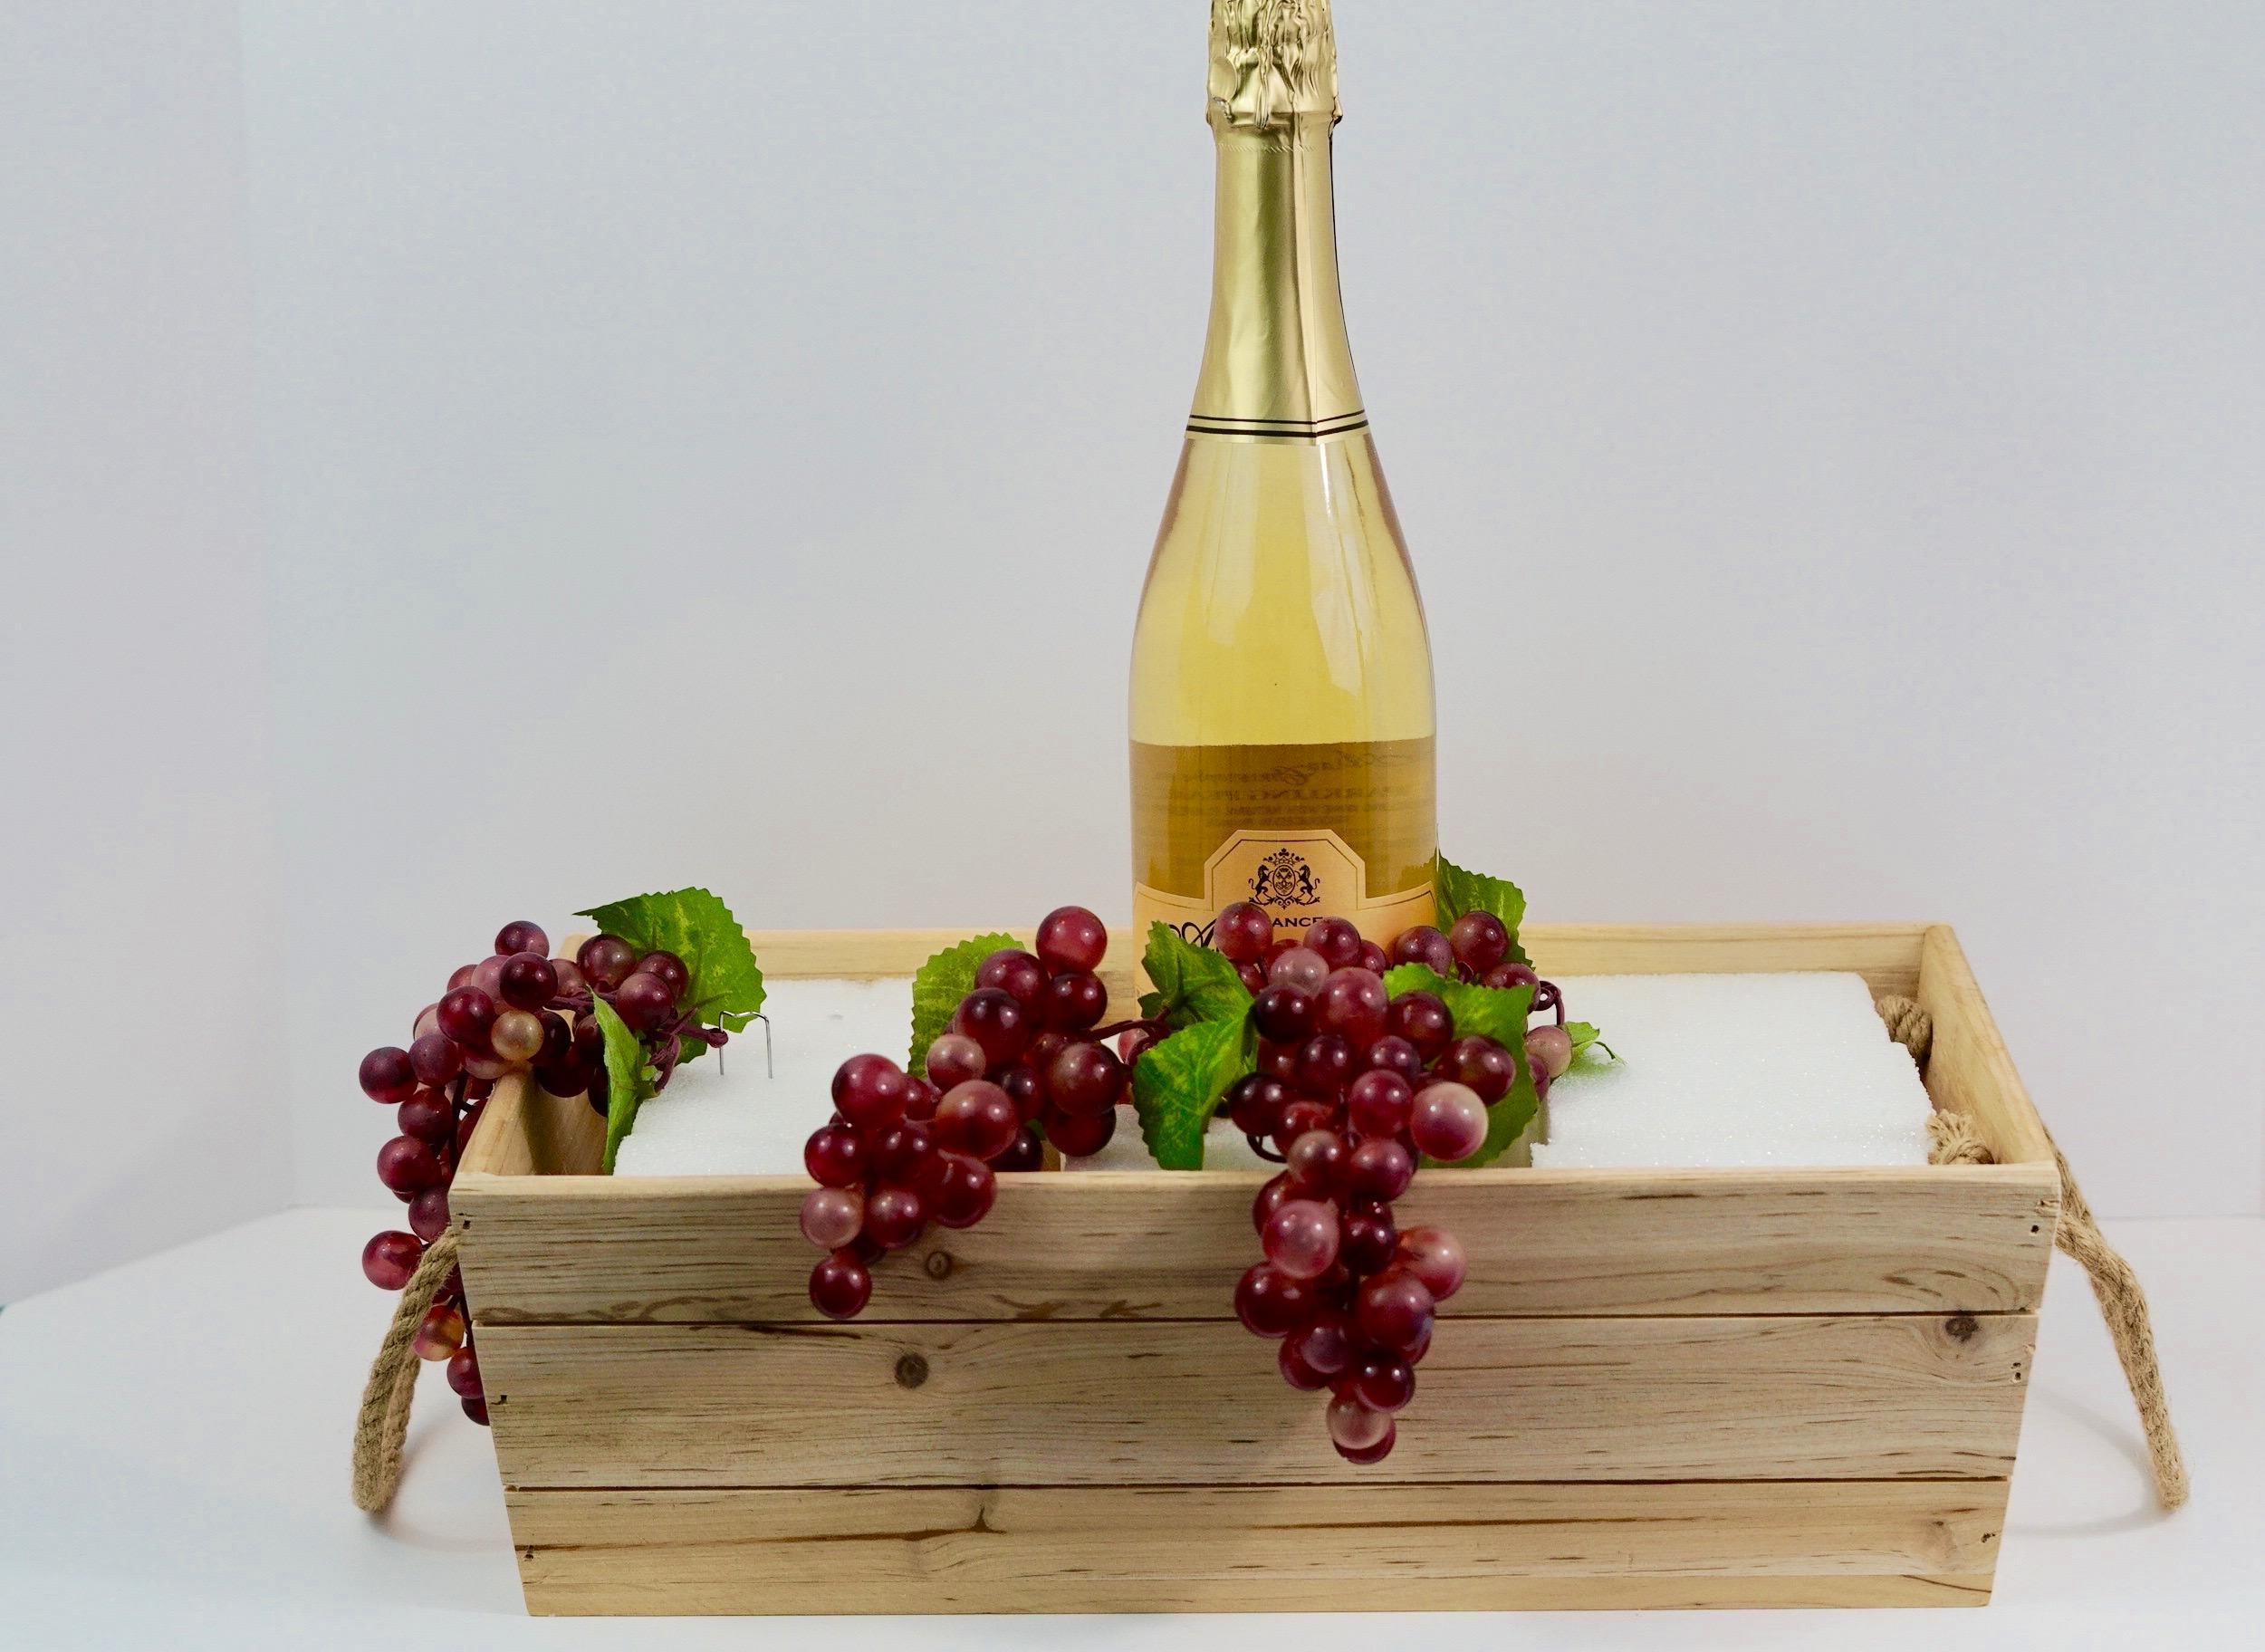 Rustic Wine Themed Wooden Crate DIY Wedding Centerpiece